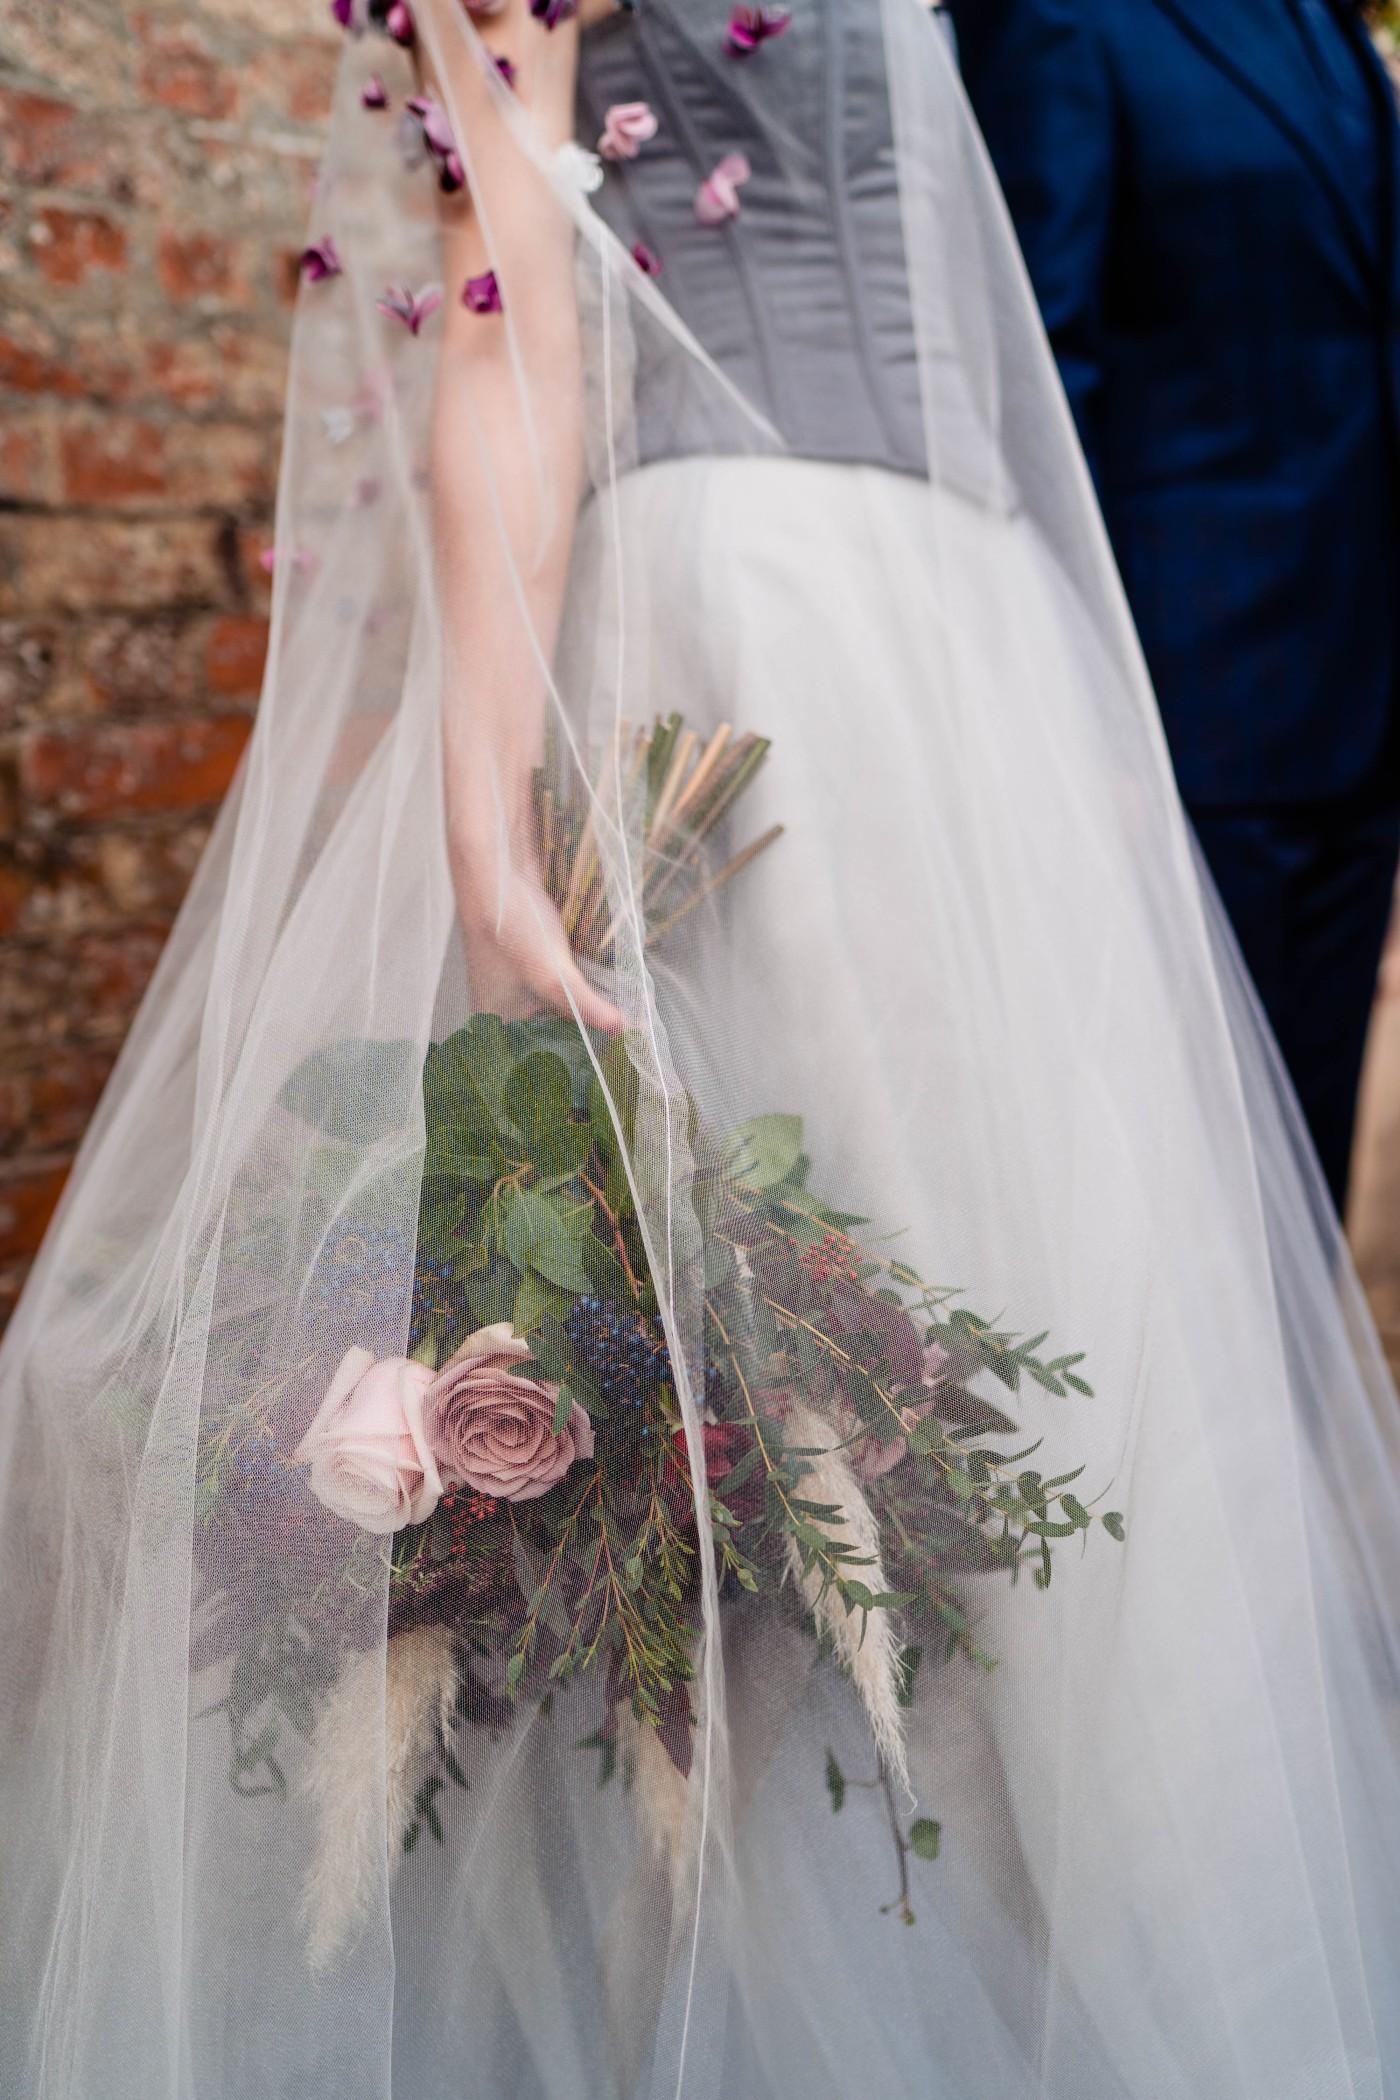 A gothic wedding - national justice museum wedding - alternative wedding - Vicki Clayson Photography (9)